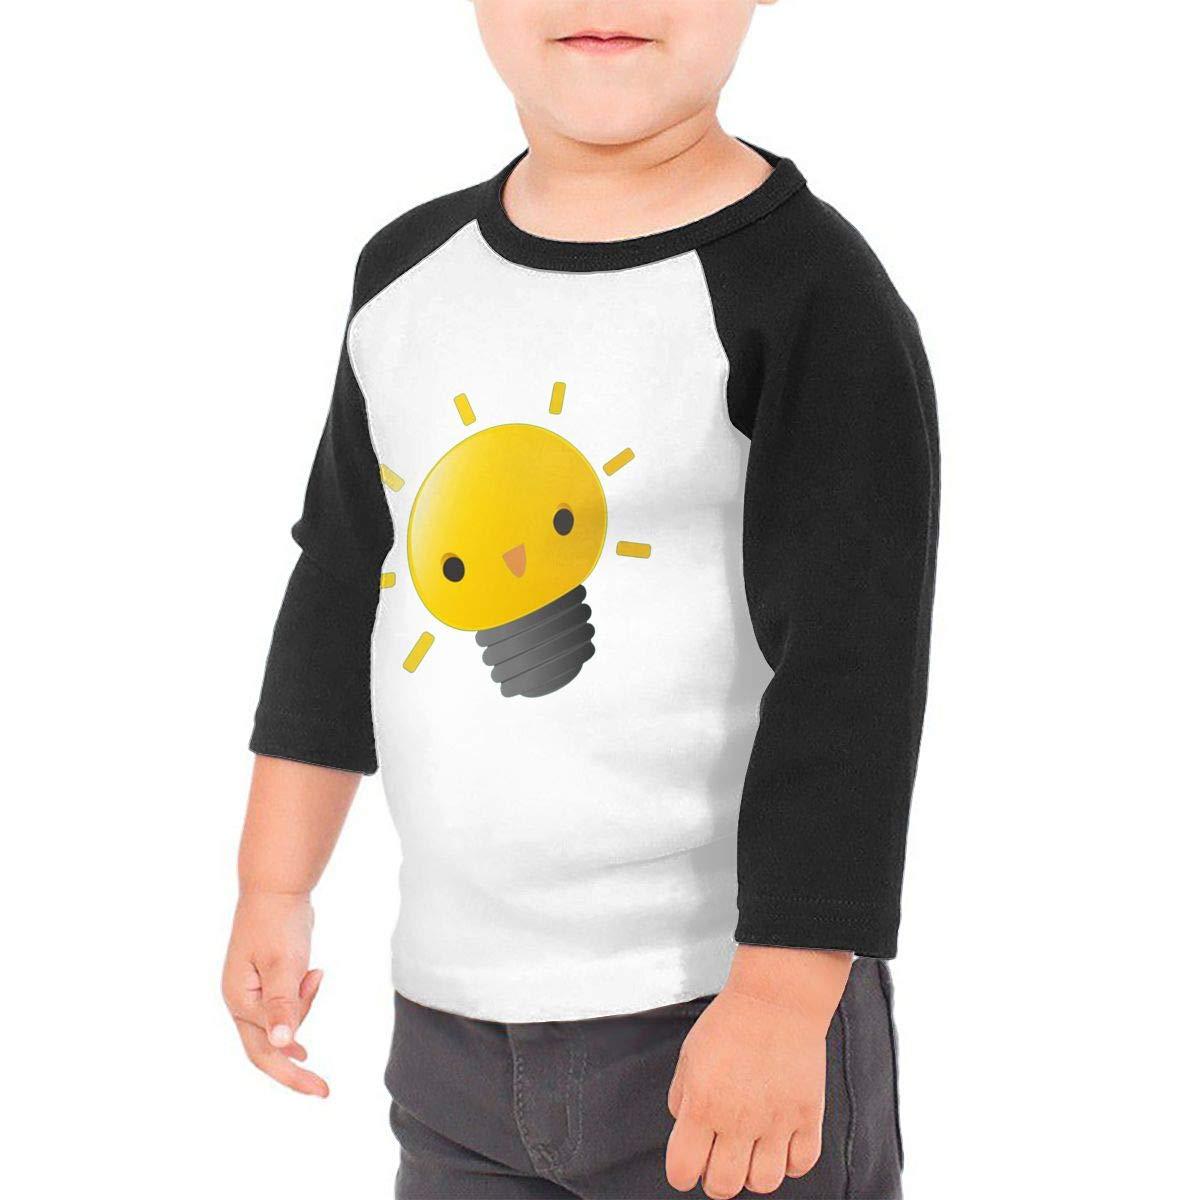 yimo Lightbulb is So Kawaii Unisex Toddler Baseball Jersey Contrast 3//4 Sleeves Tee